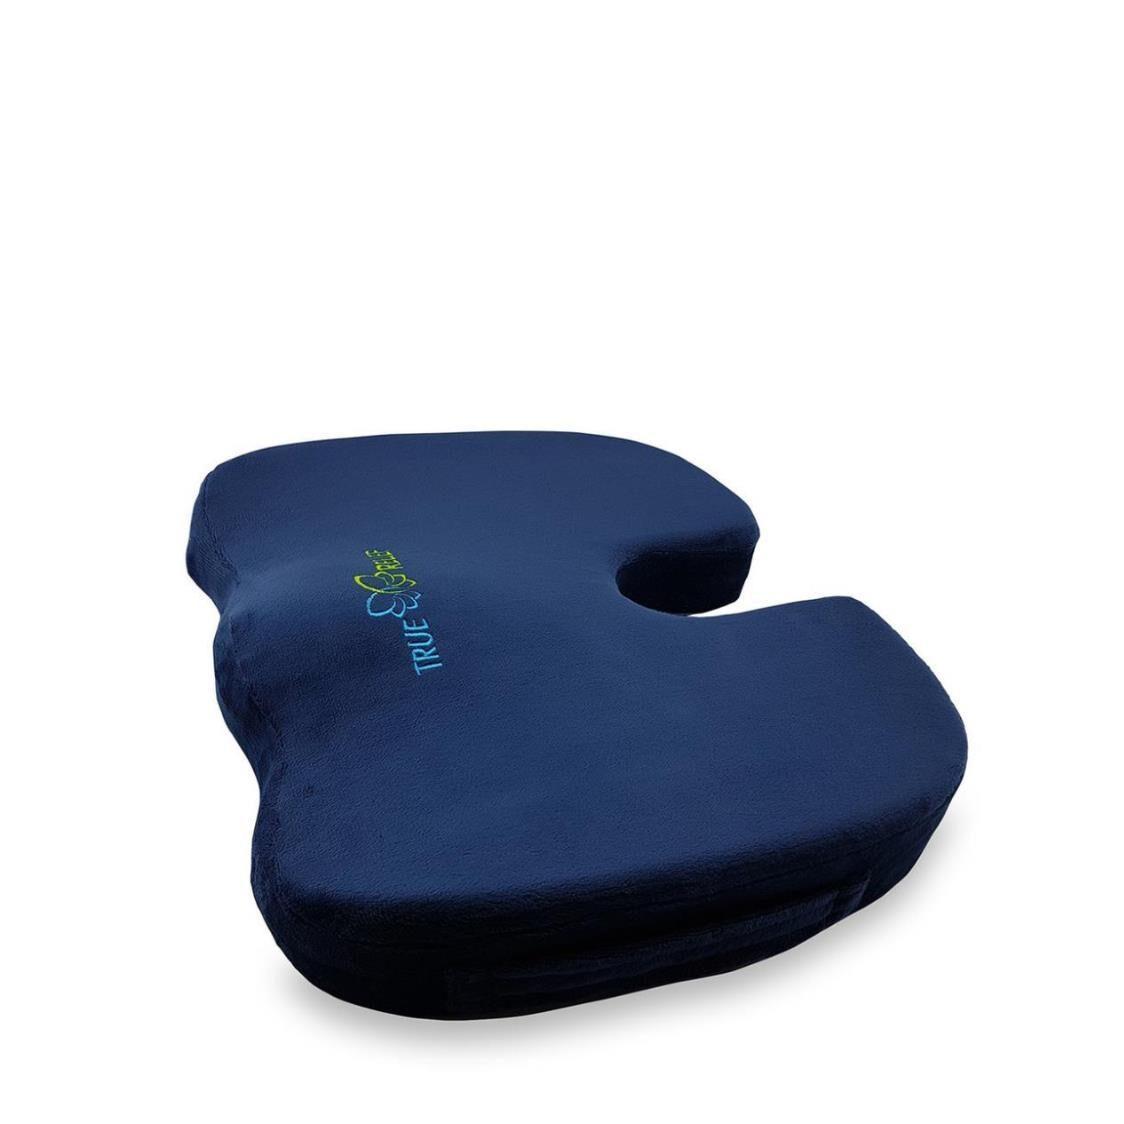 True Relief Memory Foam Seat Cushion